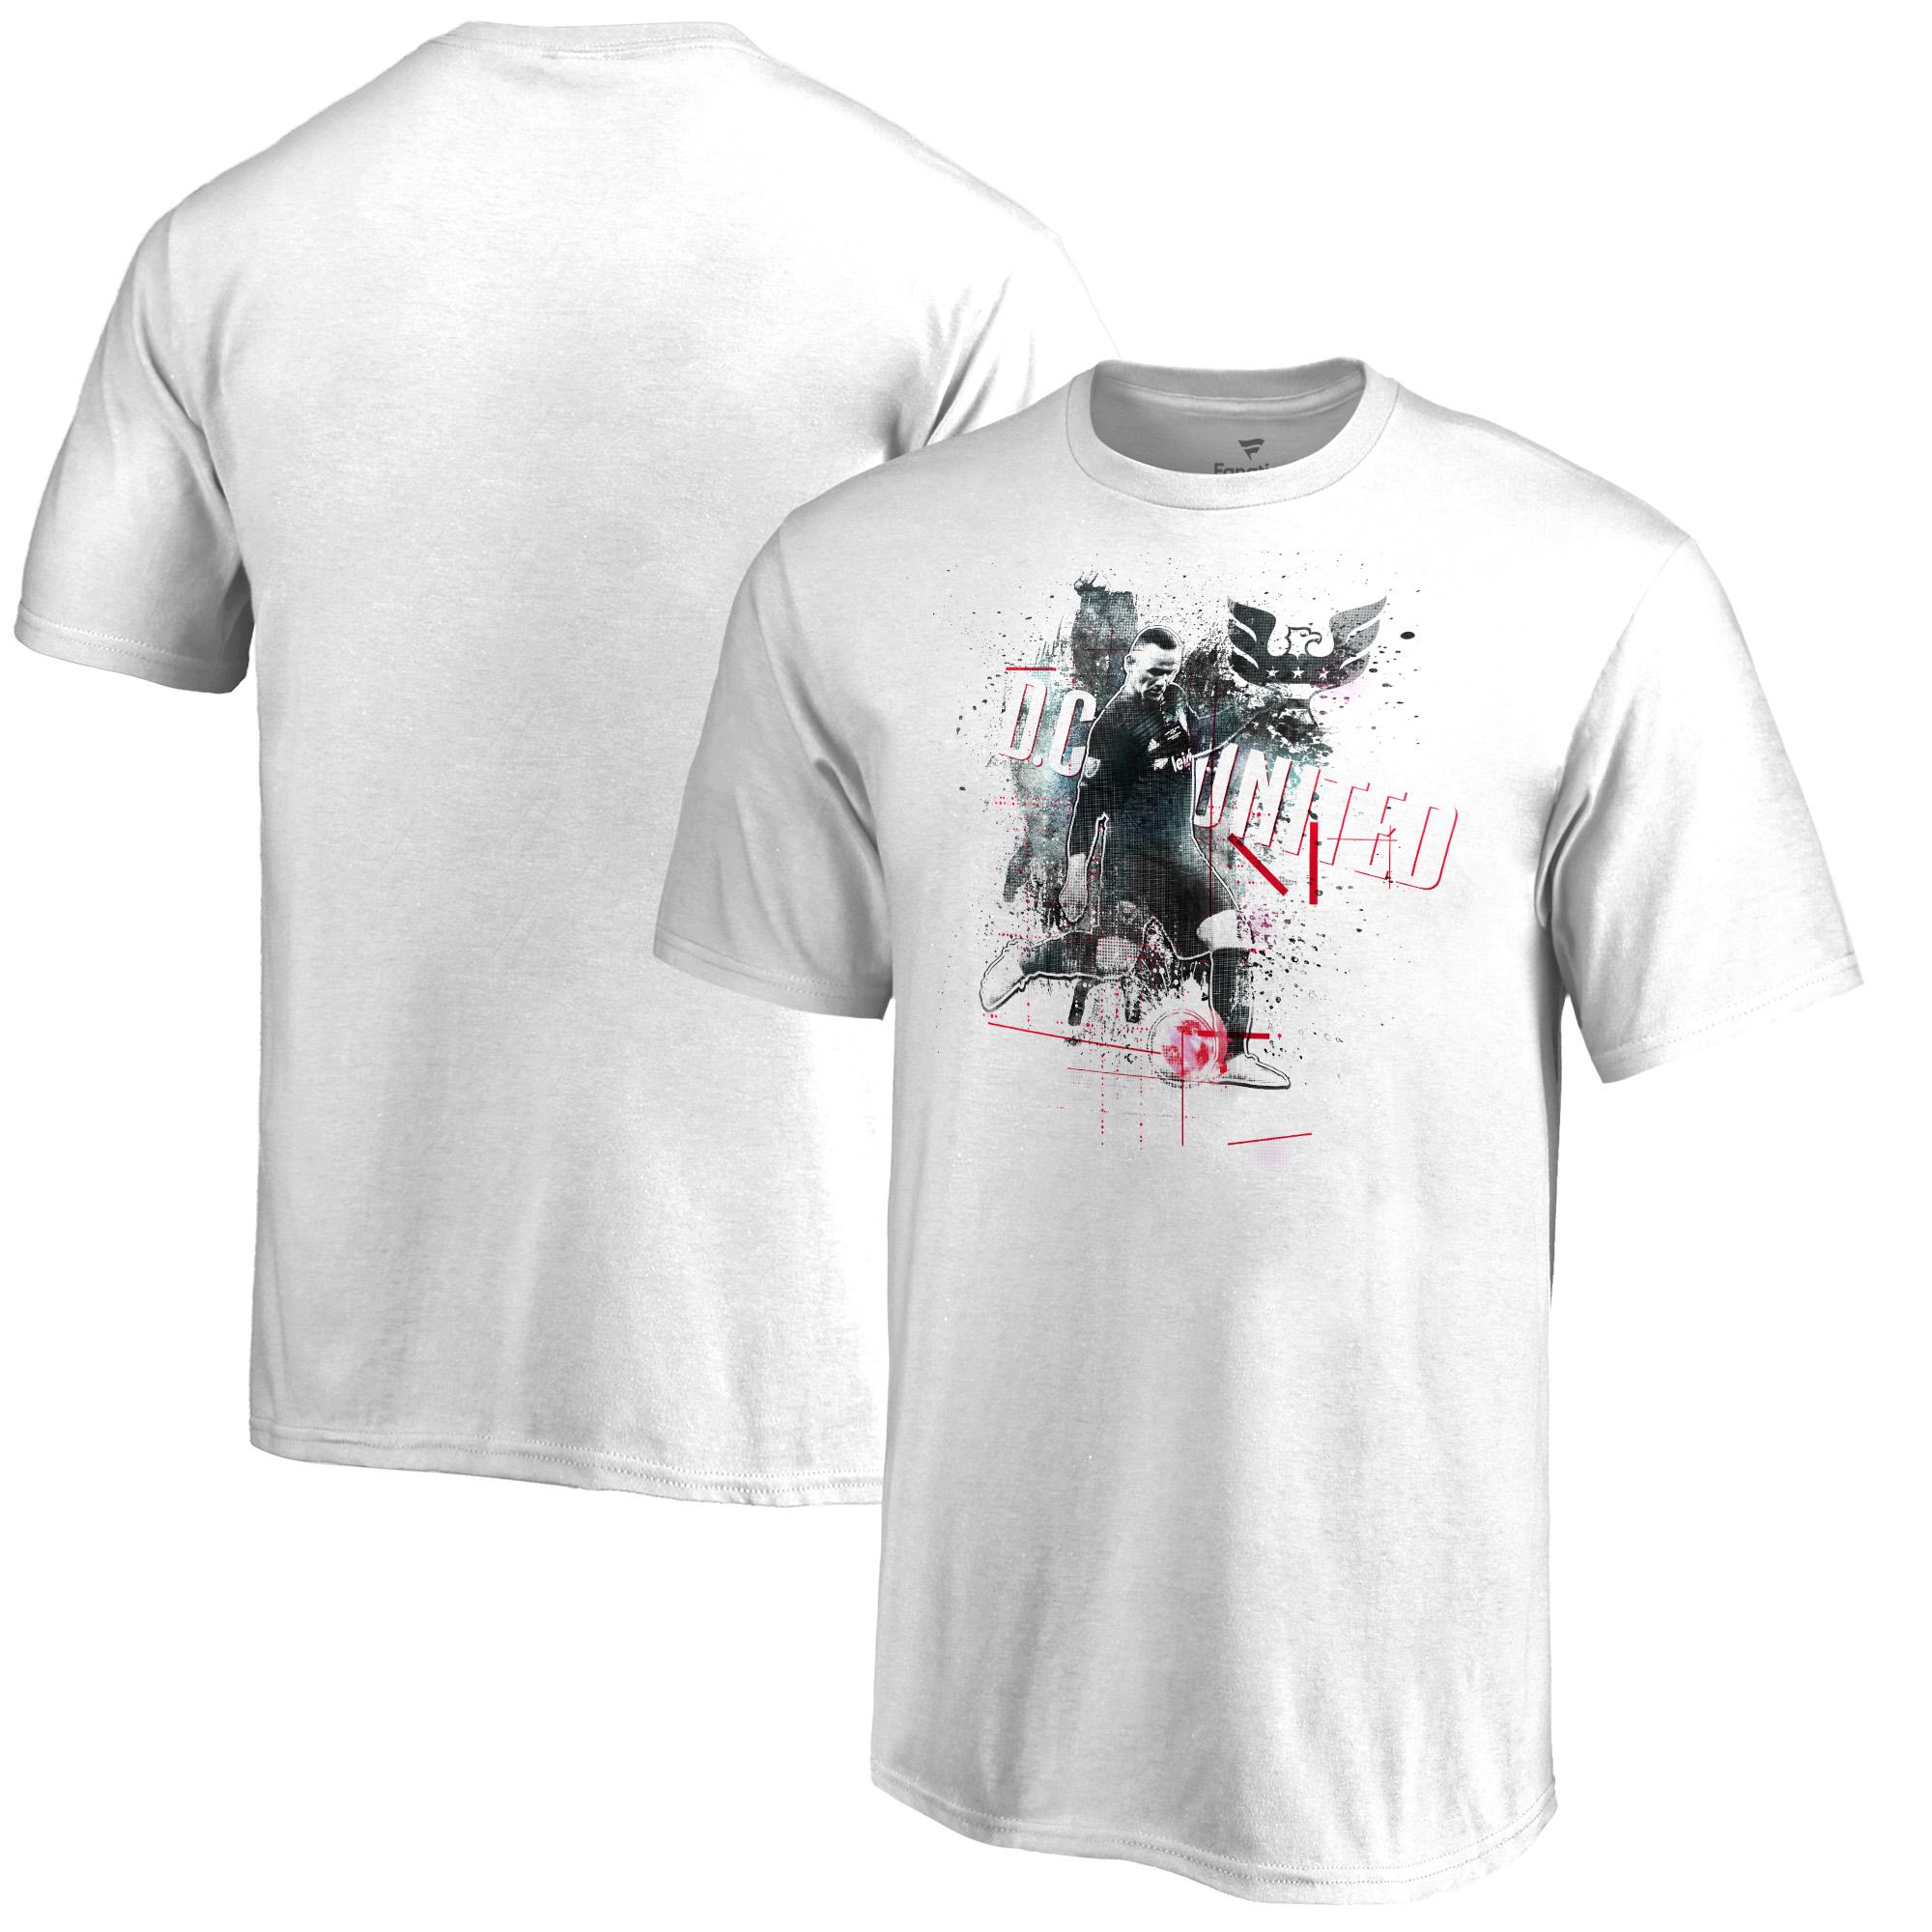 Wayne Rooney D.C. United Fanatics Branded Youth Image T-Shirt - White